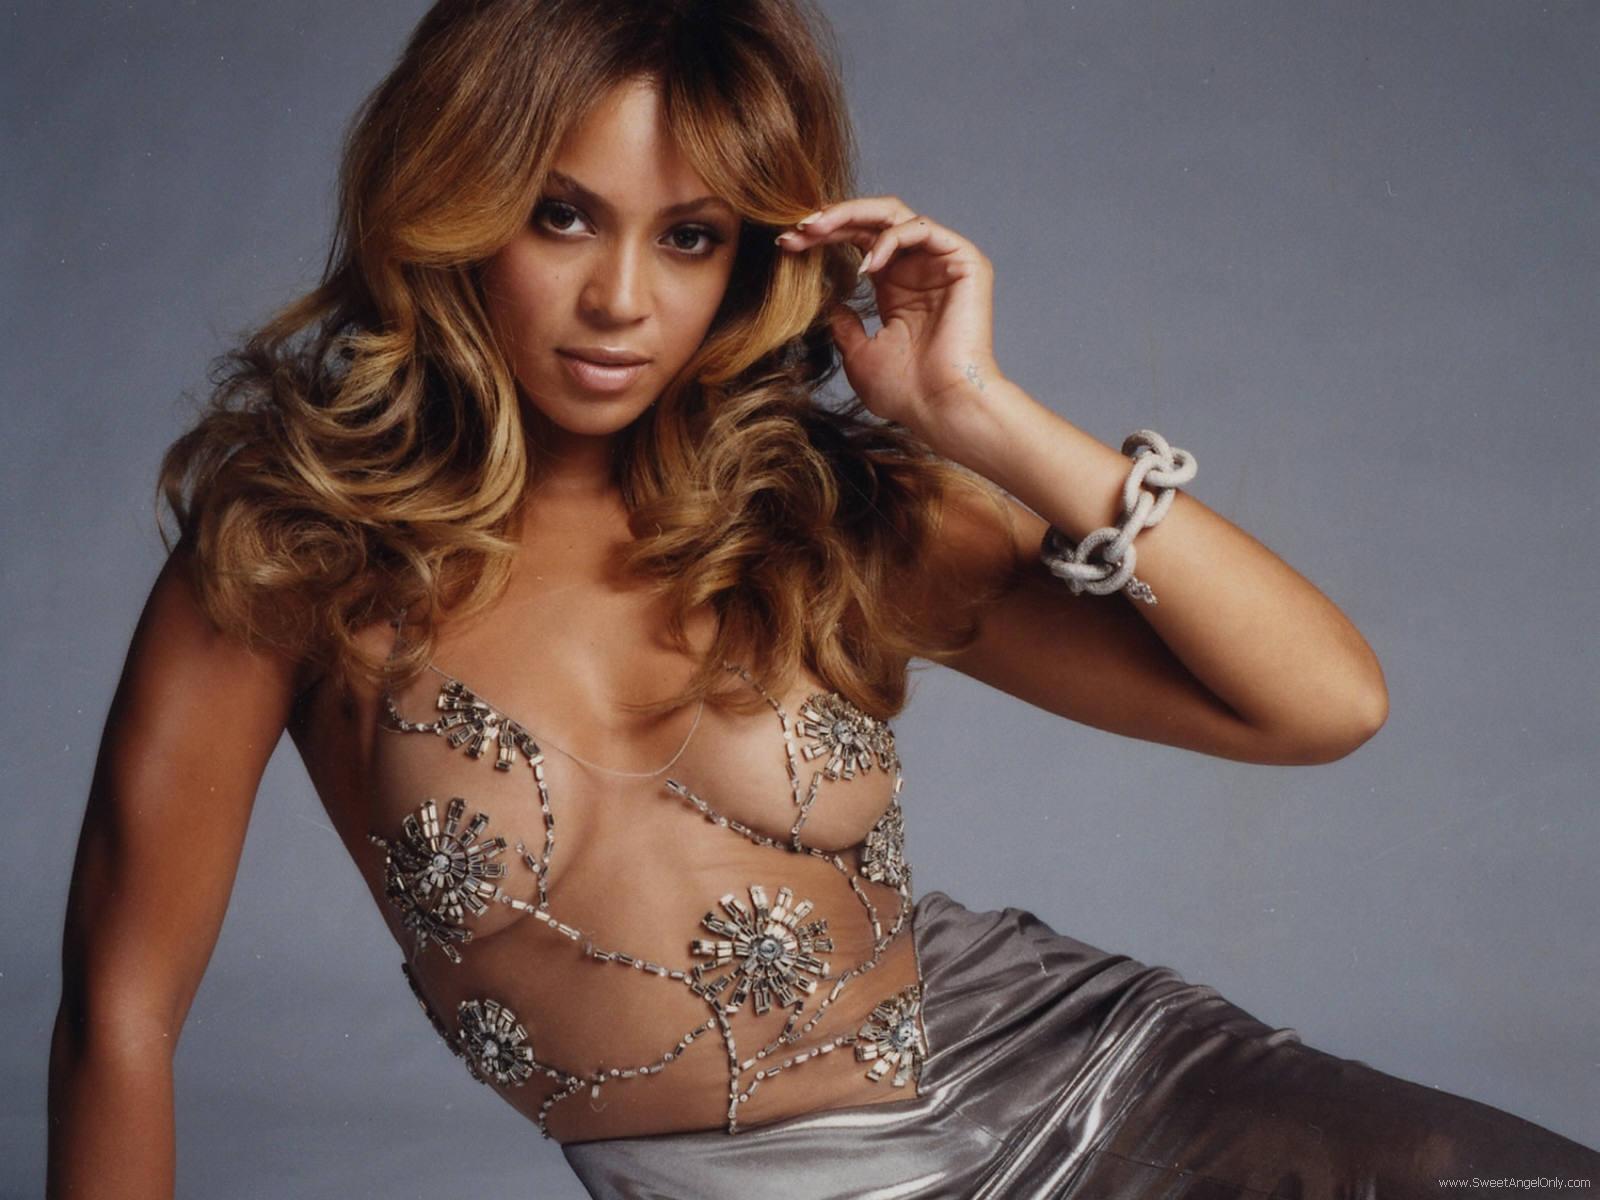 http://3.bp.blogspot.com/-zjUQVqFBKQ0/TxV69NZTc7I/AAAAAAAABSQ/dYv5Z7zU9XA/s1600/Beyonce-Knowles-Hot.jpg